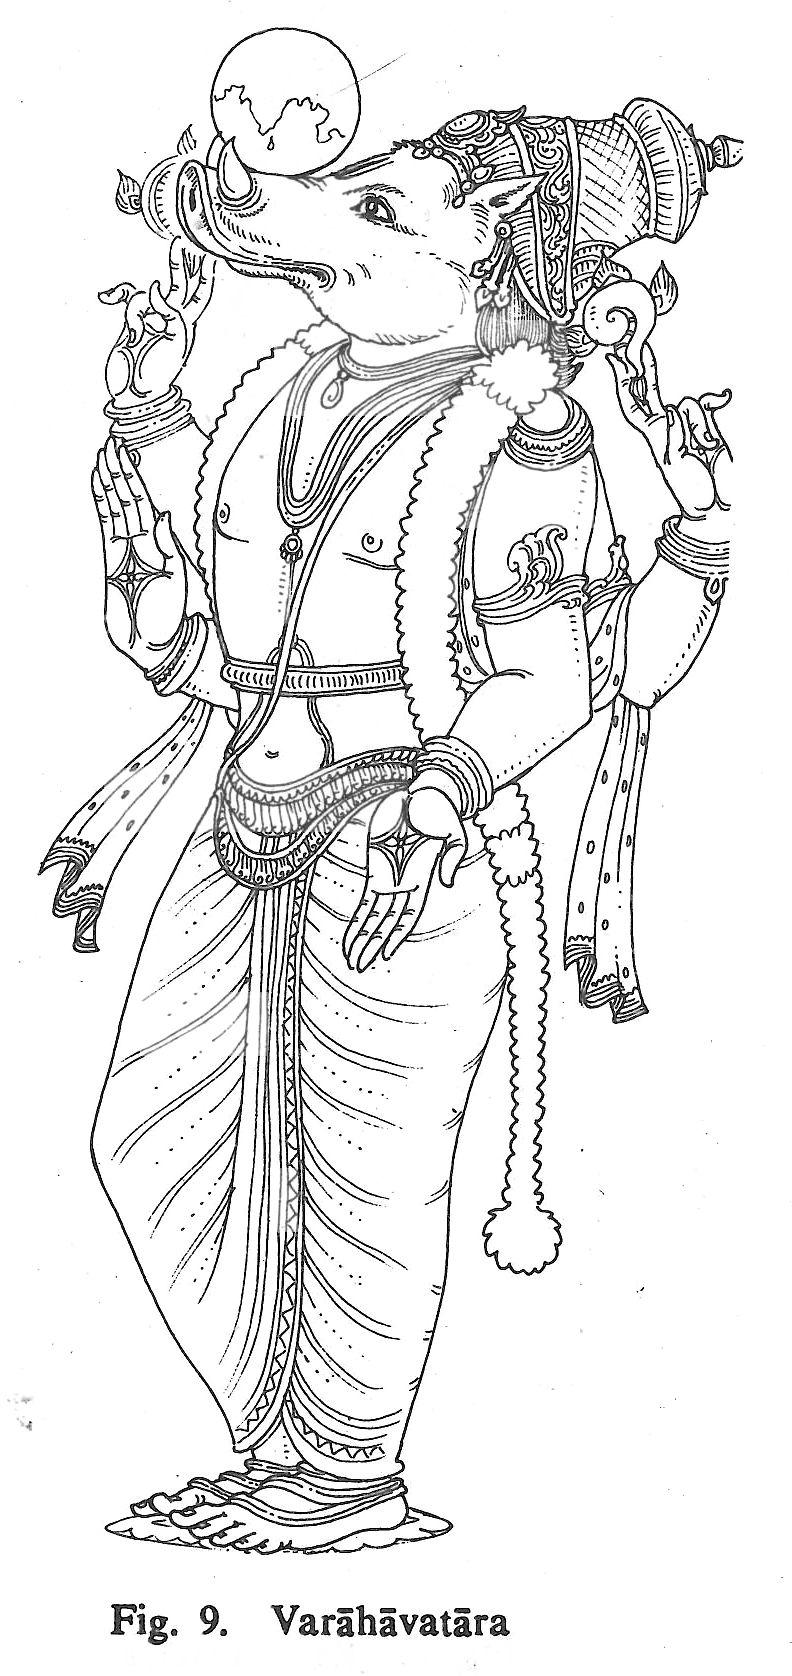 Varahavatara mural painting mural art indian gods indian art god tattoos